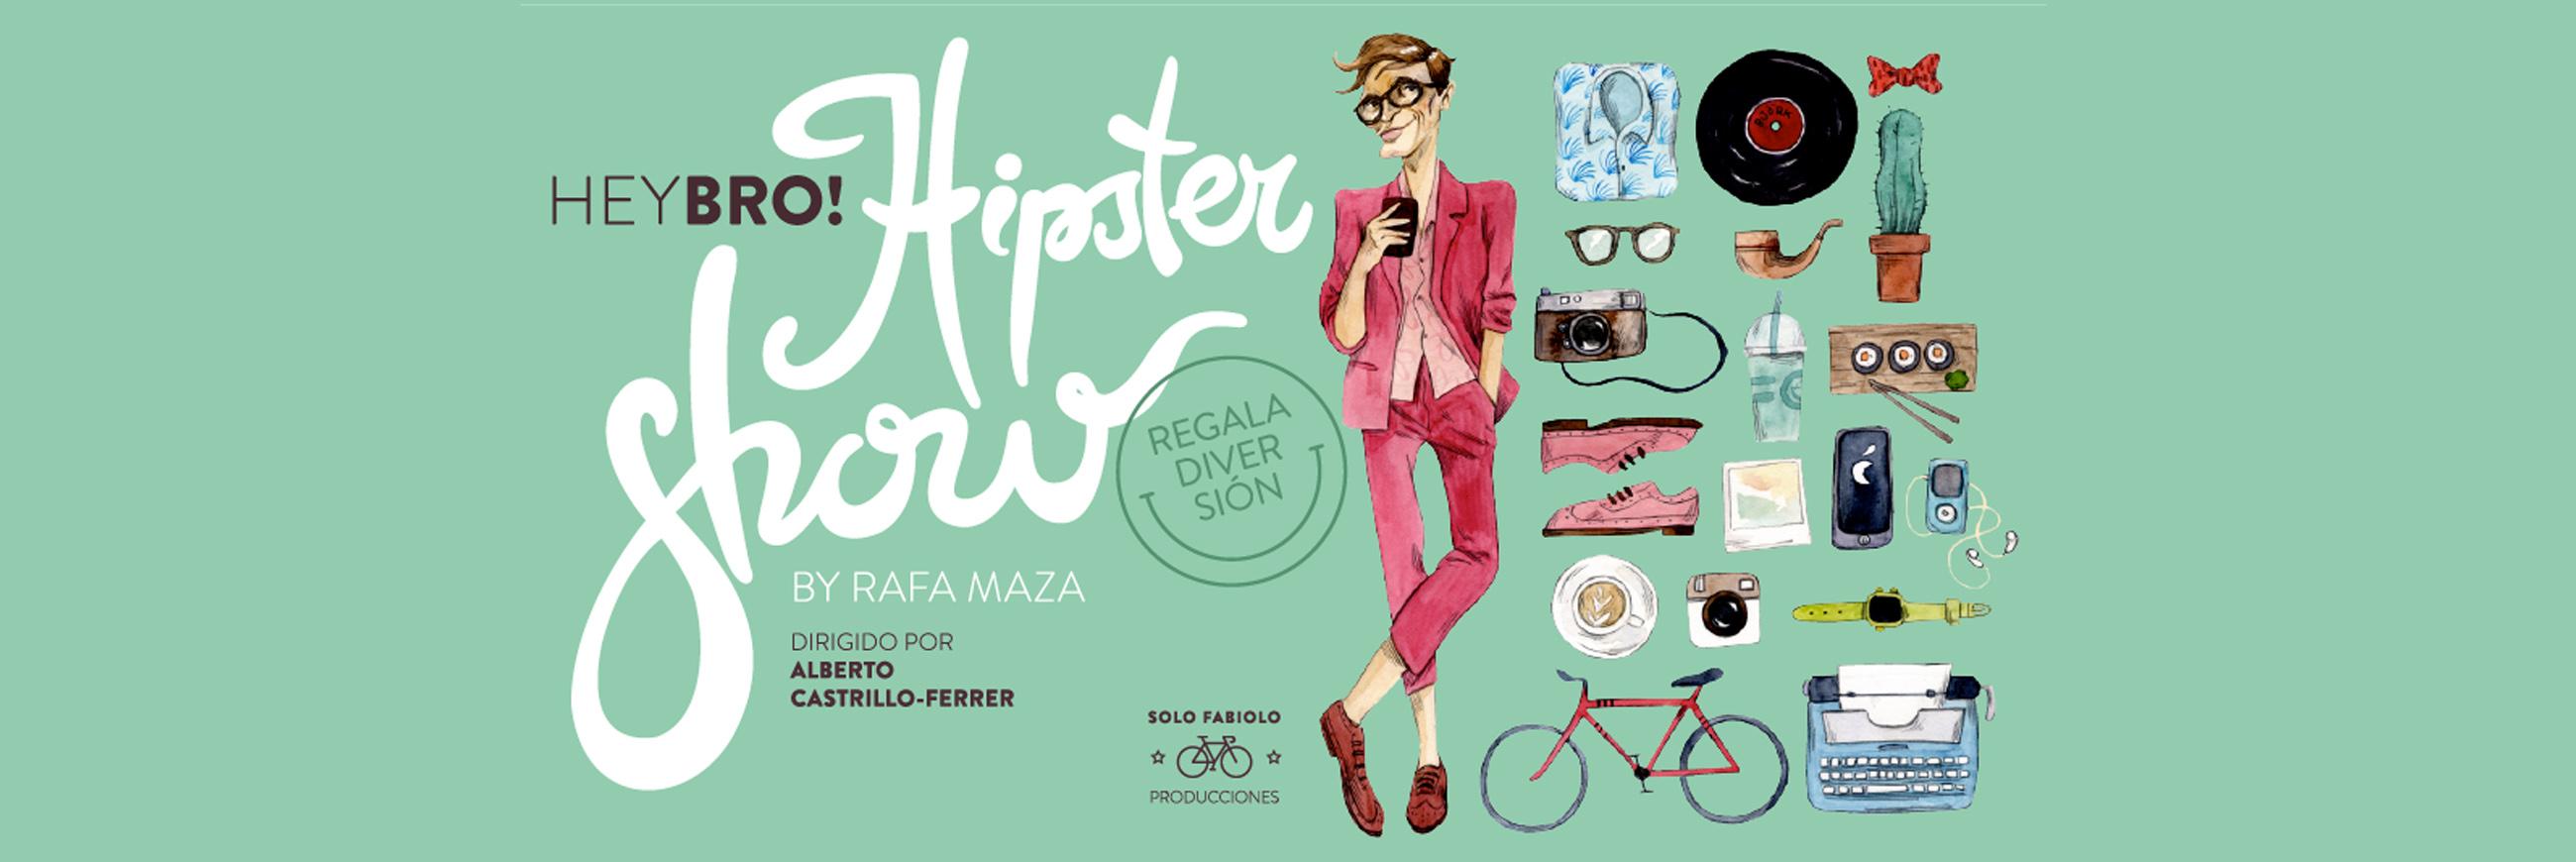 heyBro! Hipster show